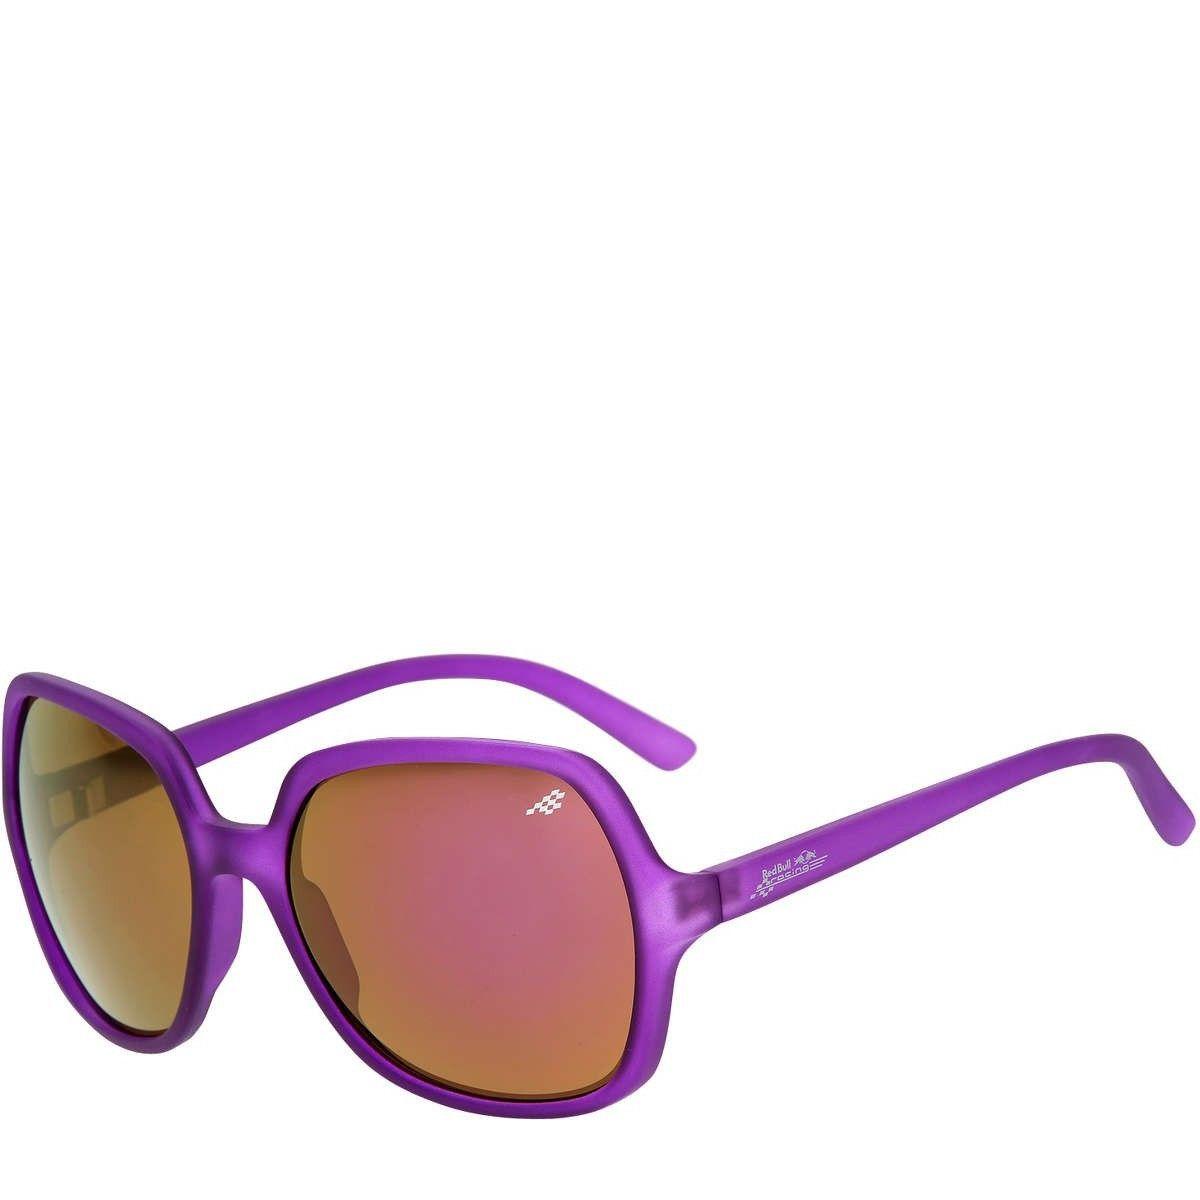 RED BULL RACING Sonnenbrille Accessoires Damen Brillen ...